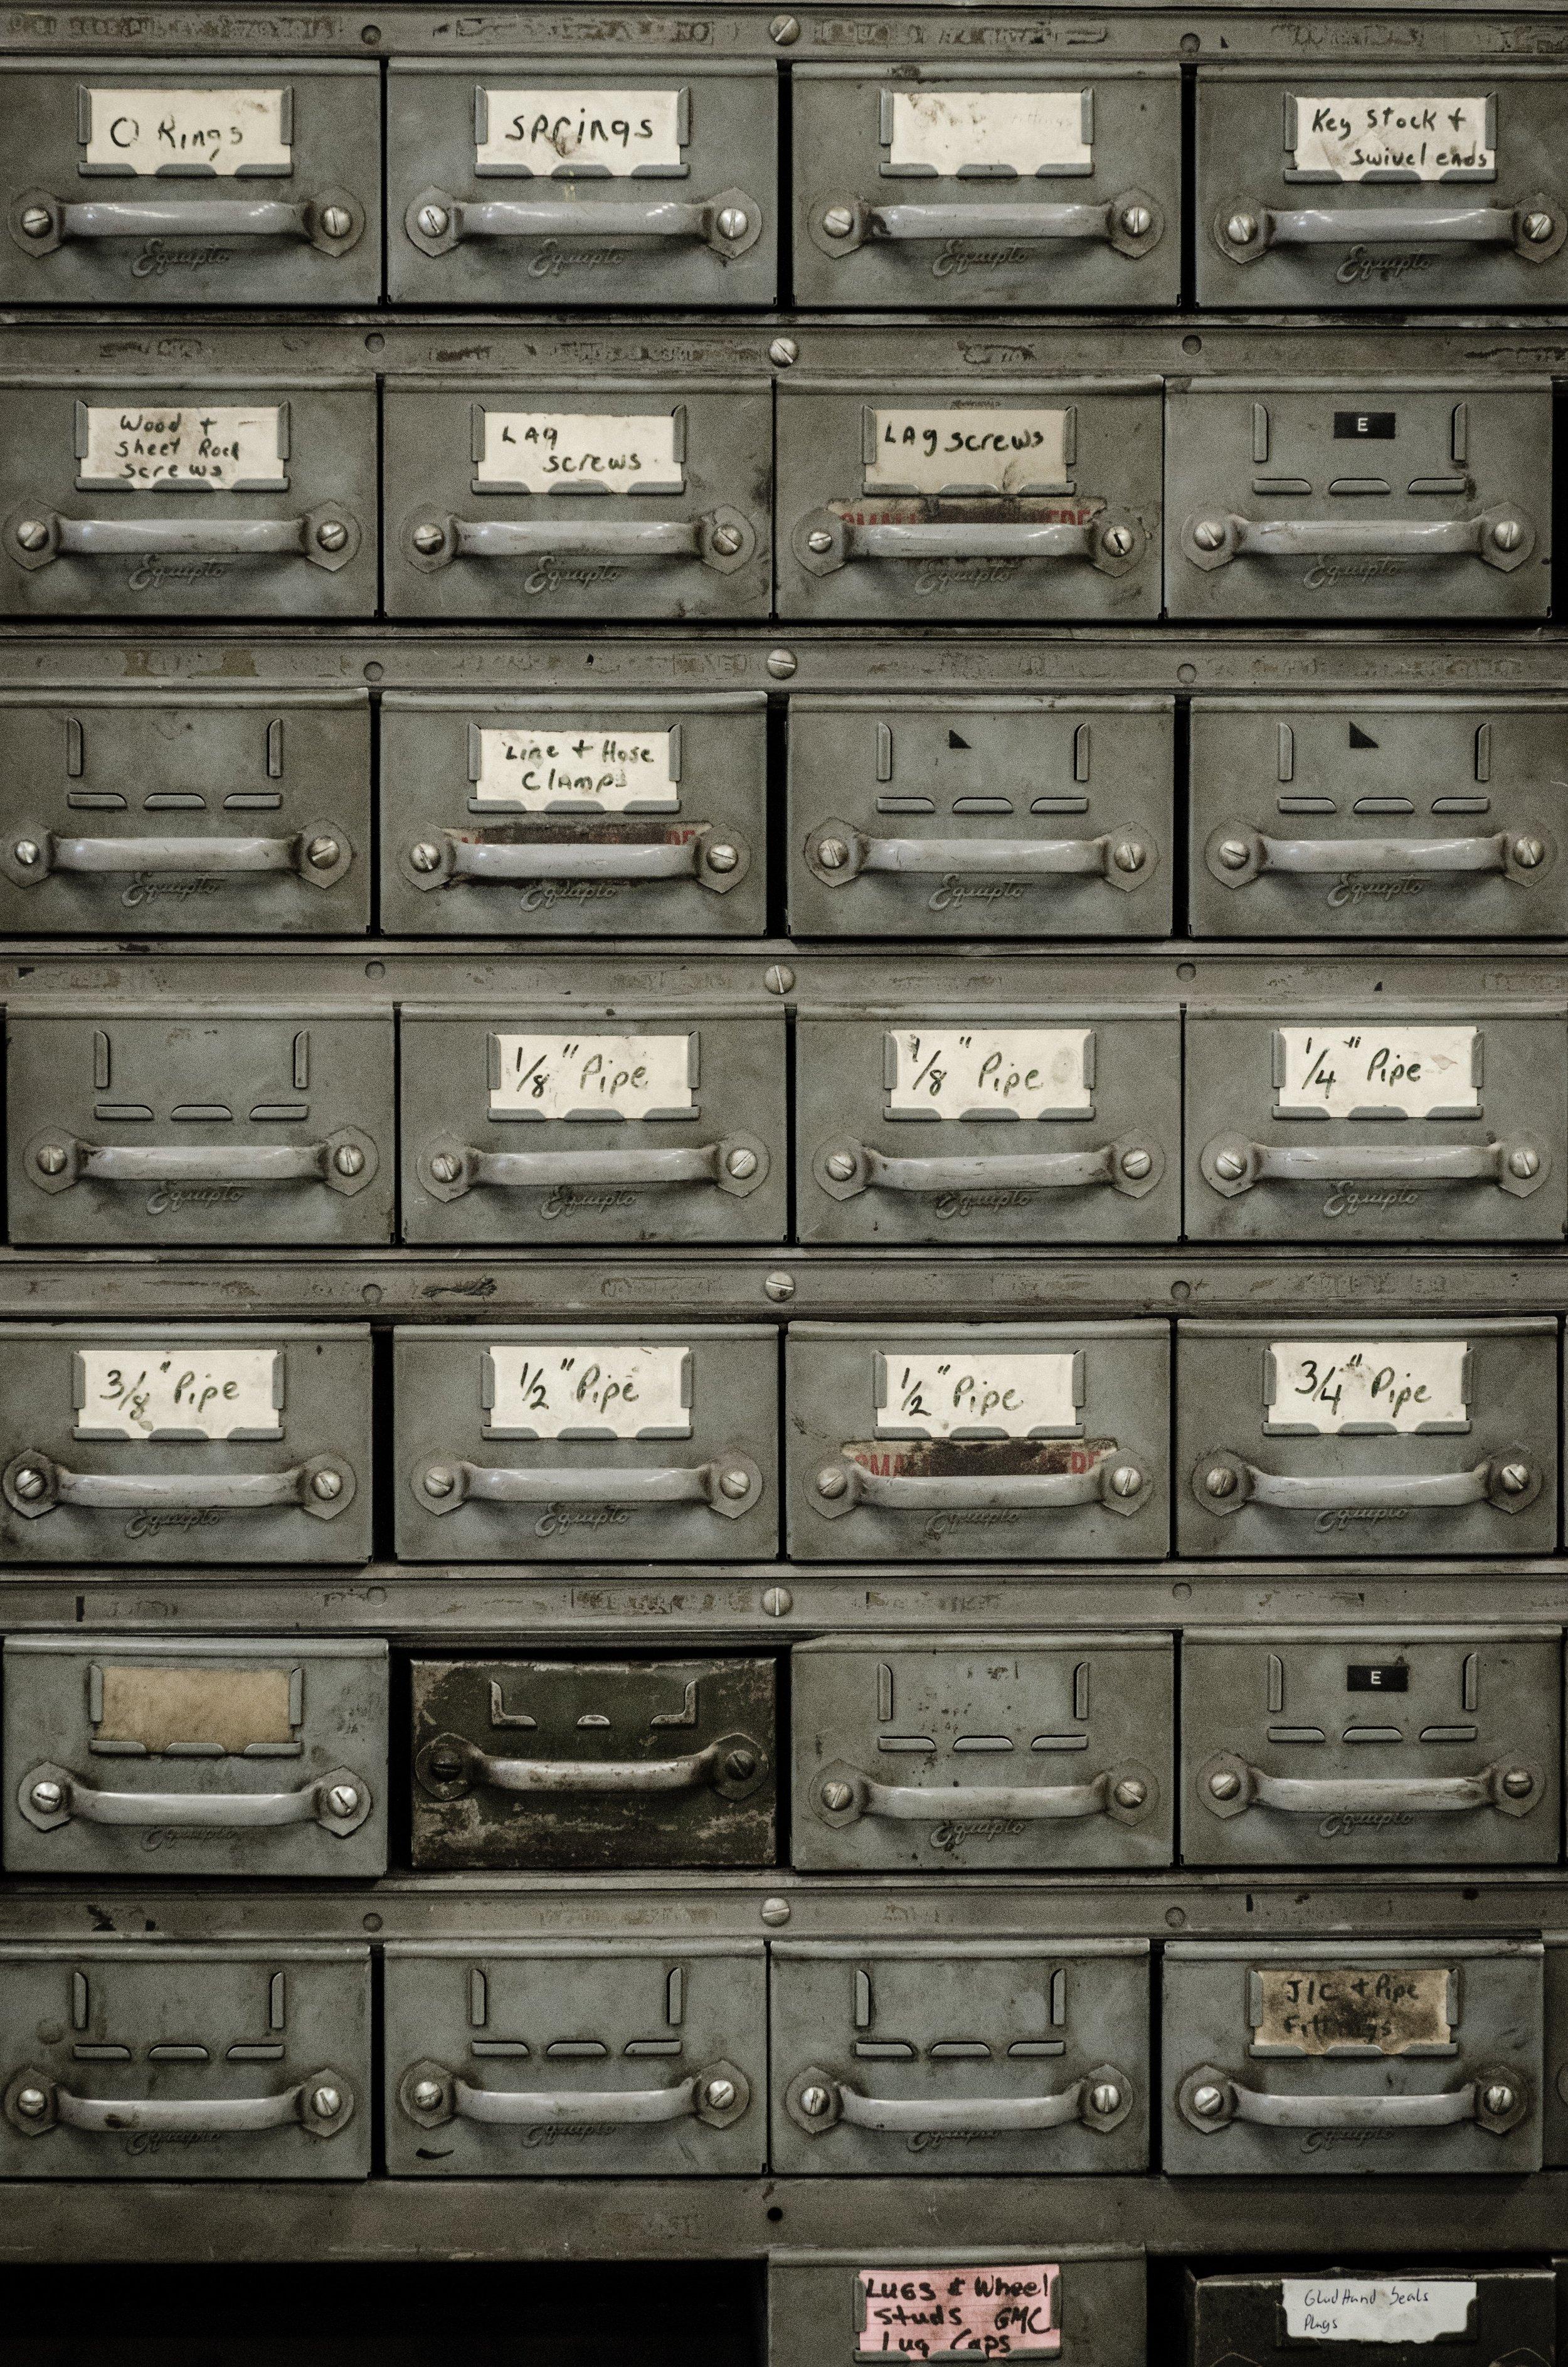 Cataloging